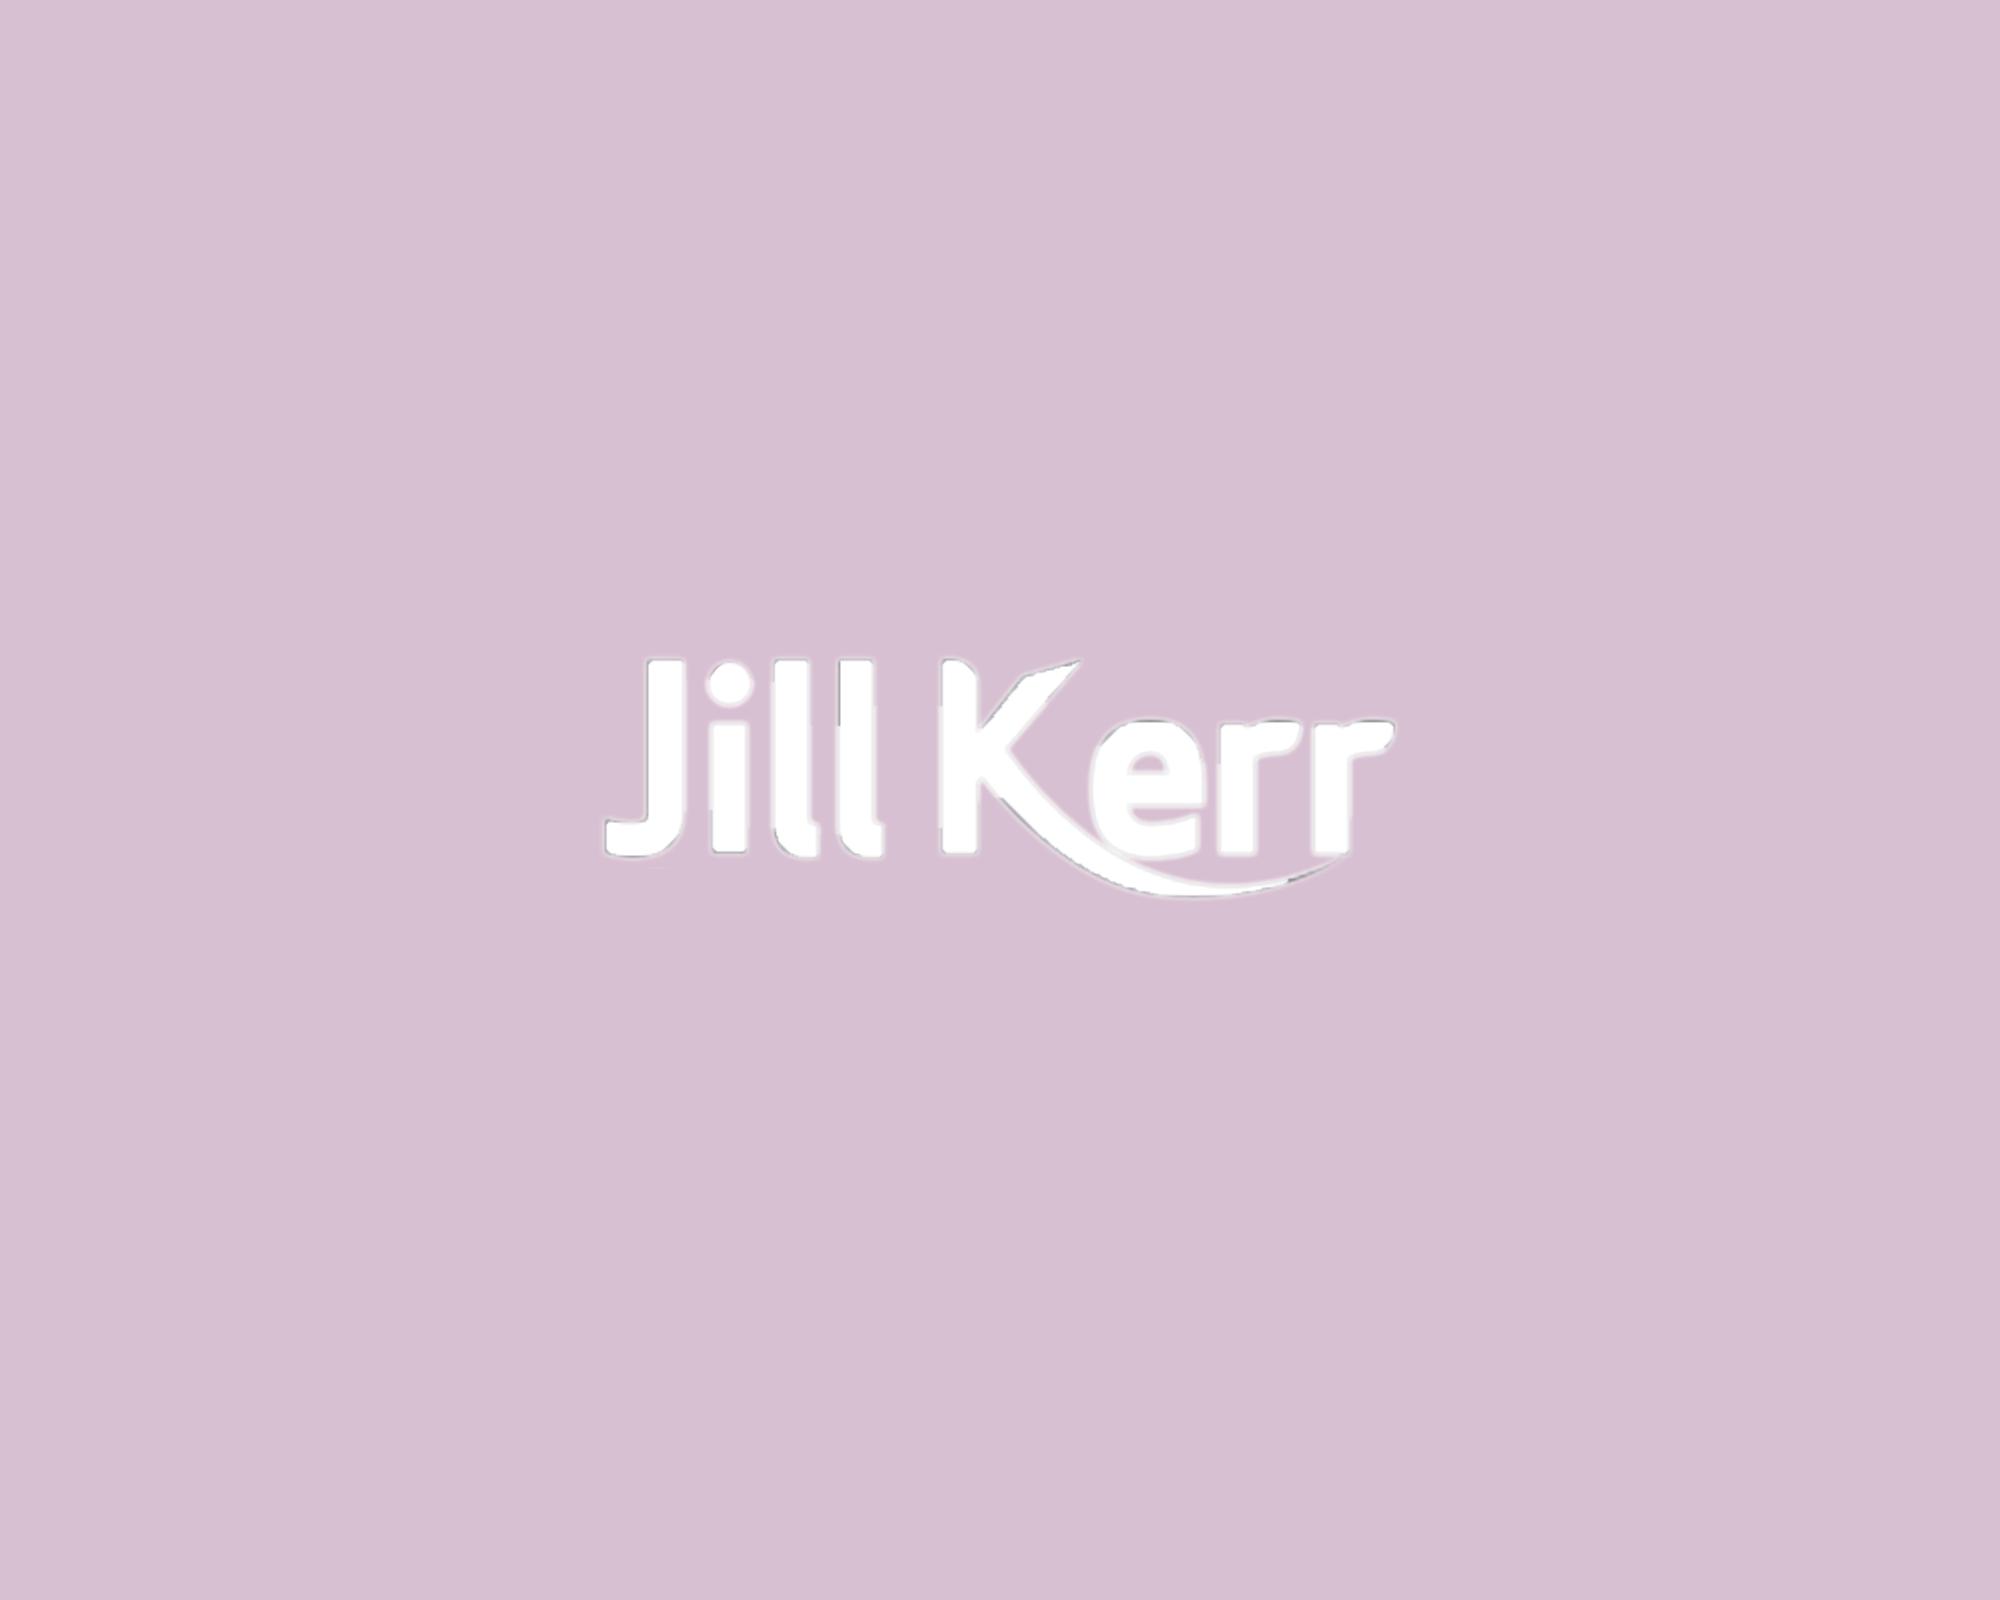 jill kerr physiotherapy Logo